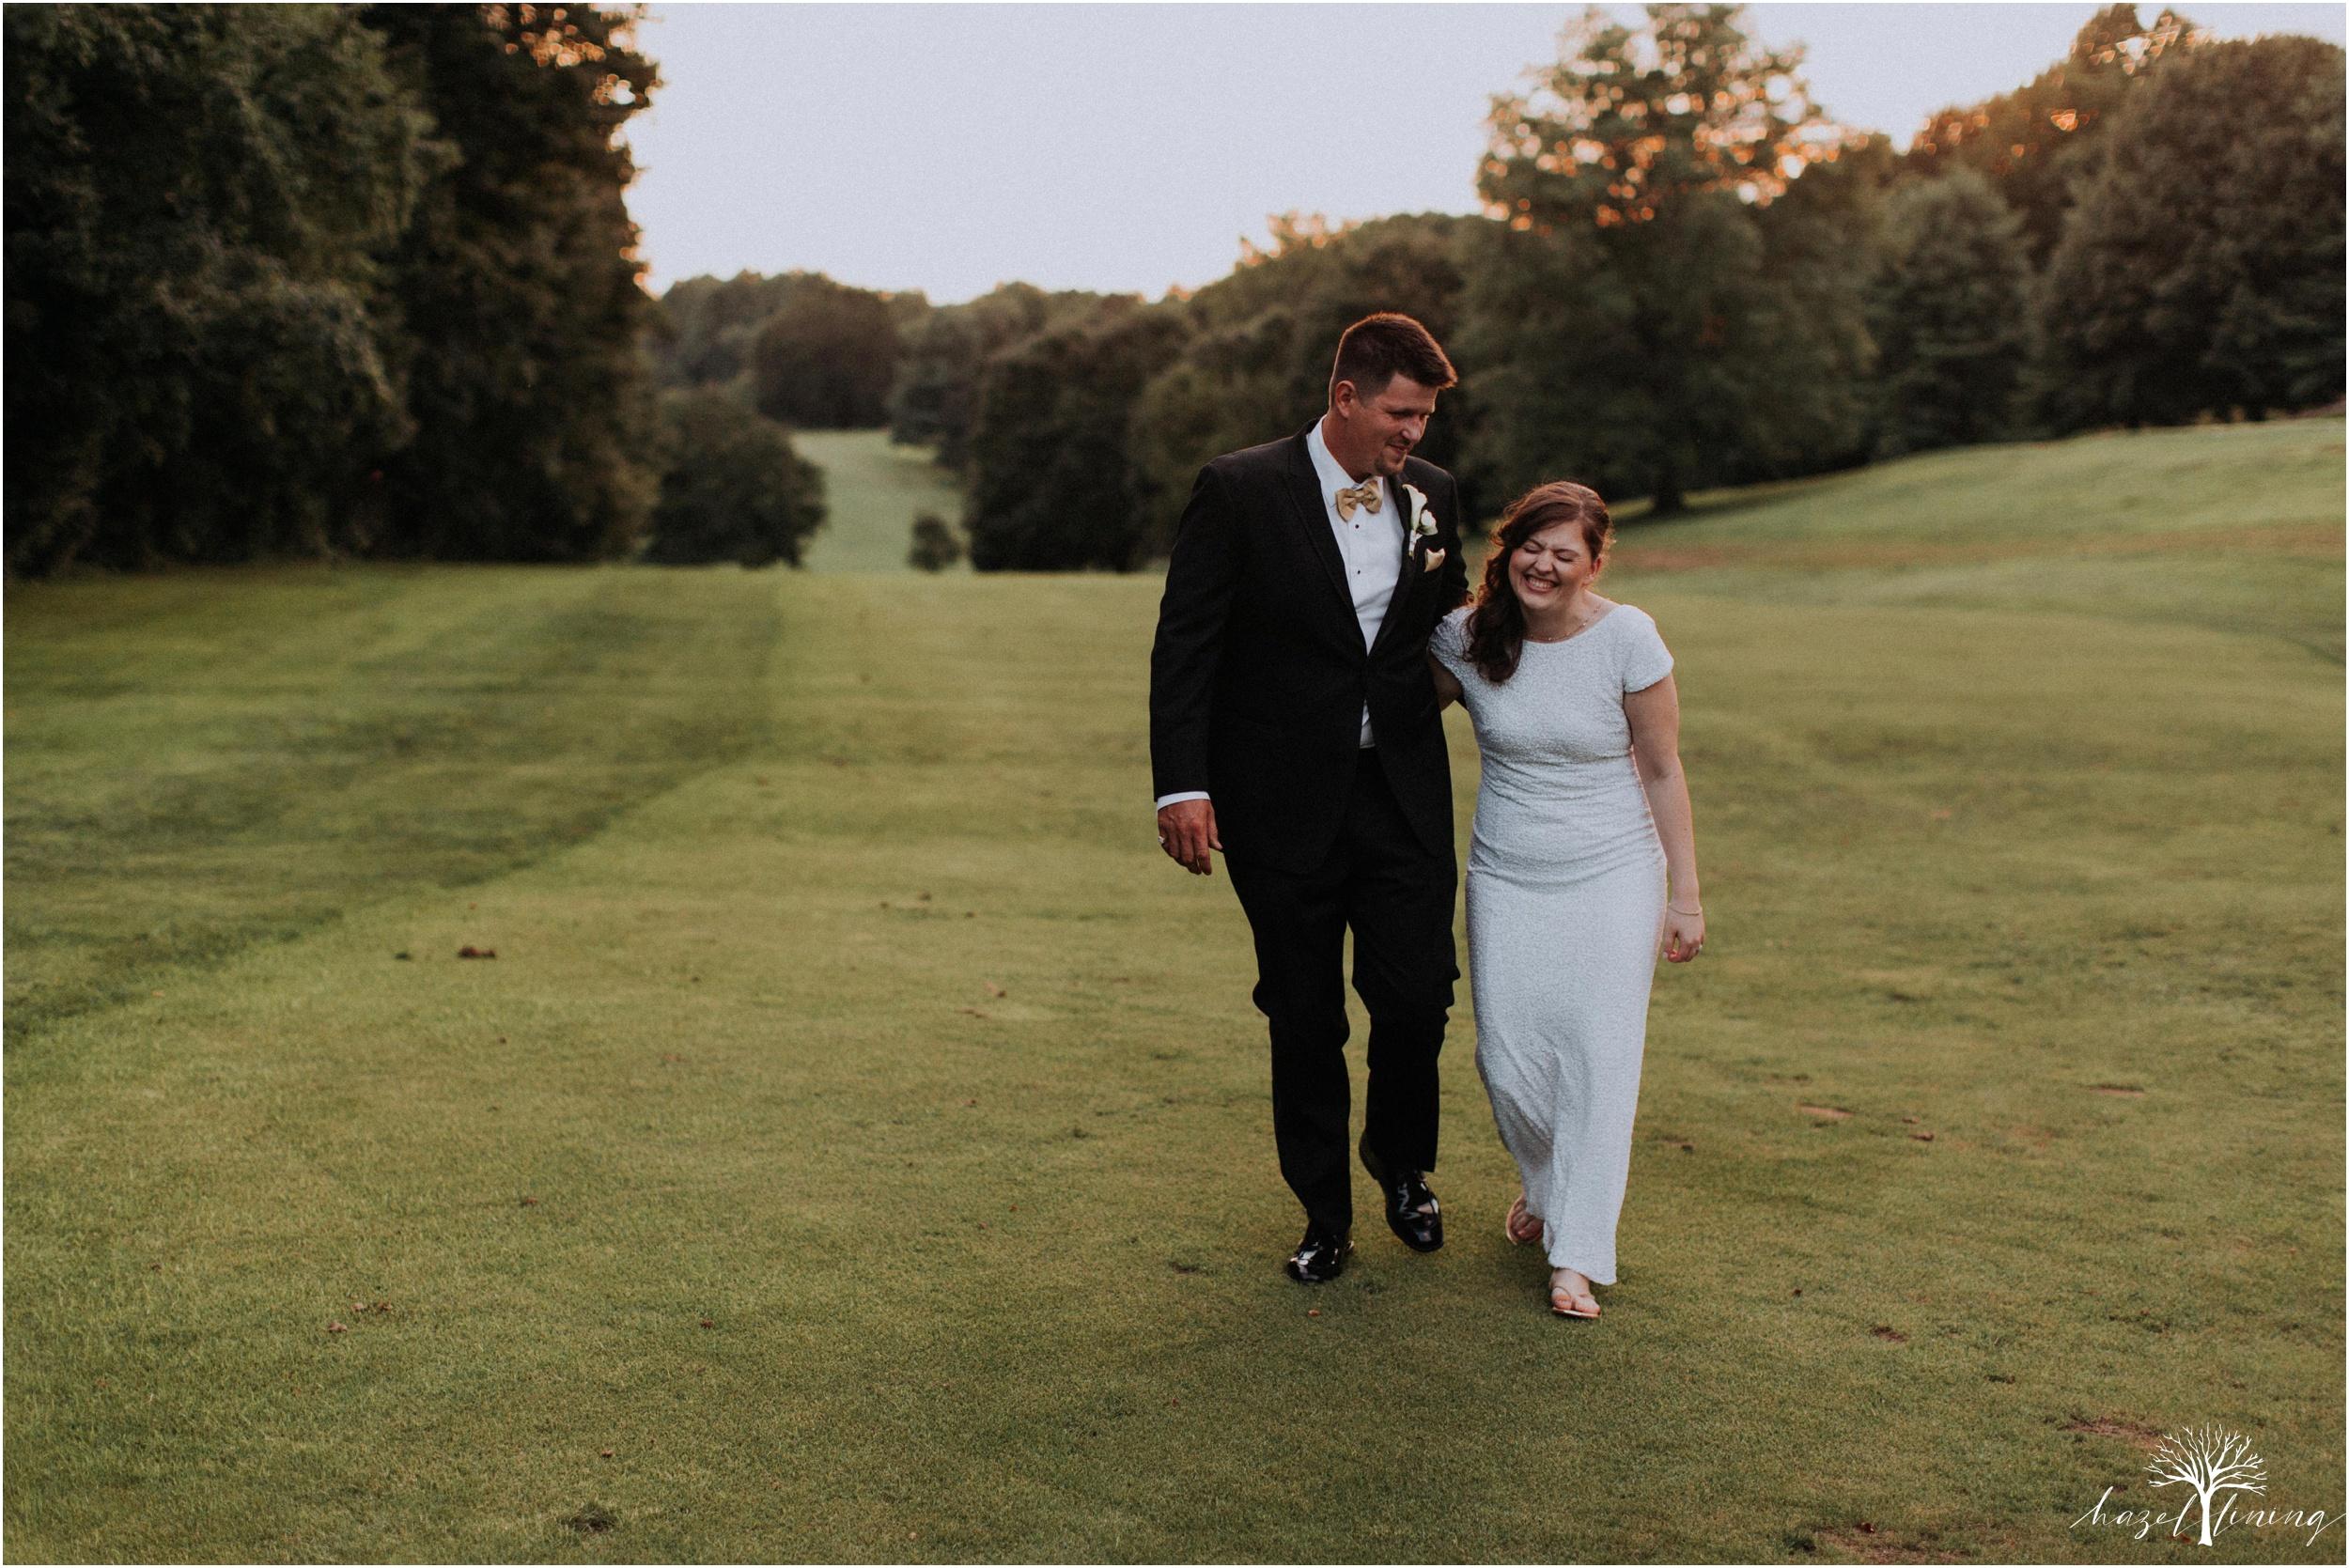 elizabeth-doelp-andrew-foreback-middletown-country-club-summer-langhorne-pennsylvania-wedding-hazel-lining-travel-wedding-elopement-photography_0182.jpg